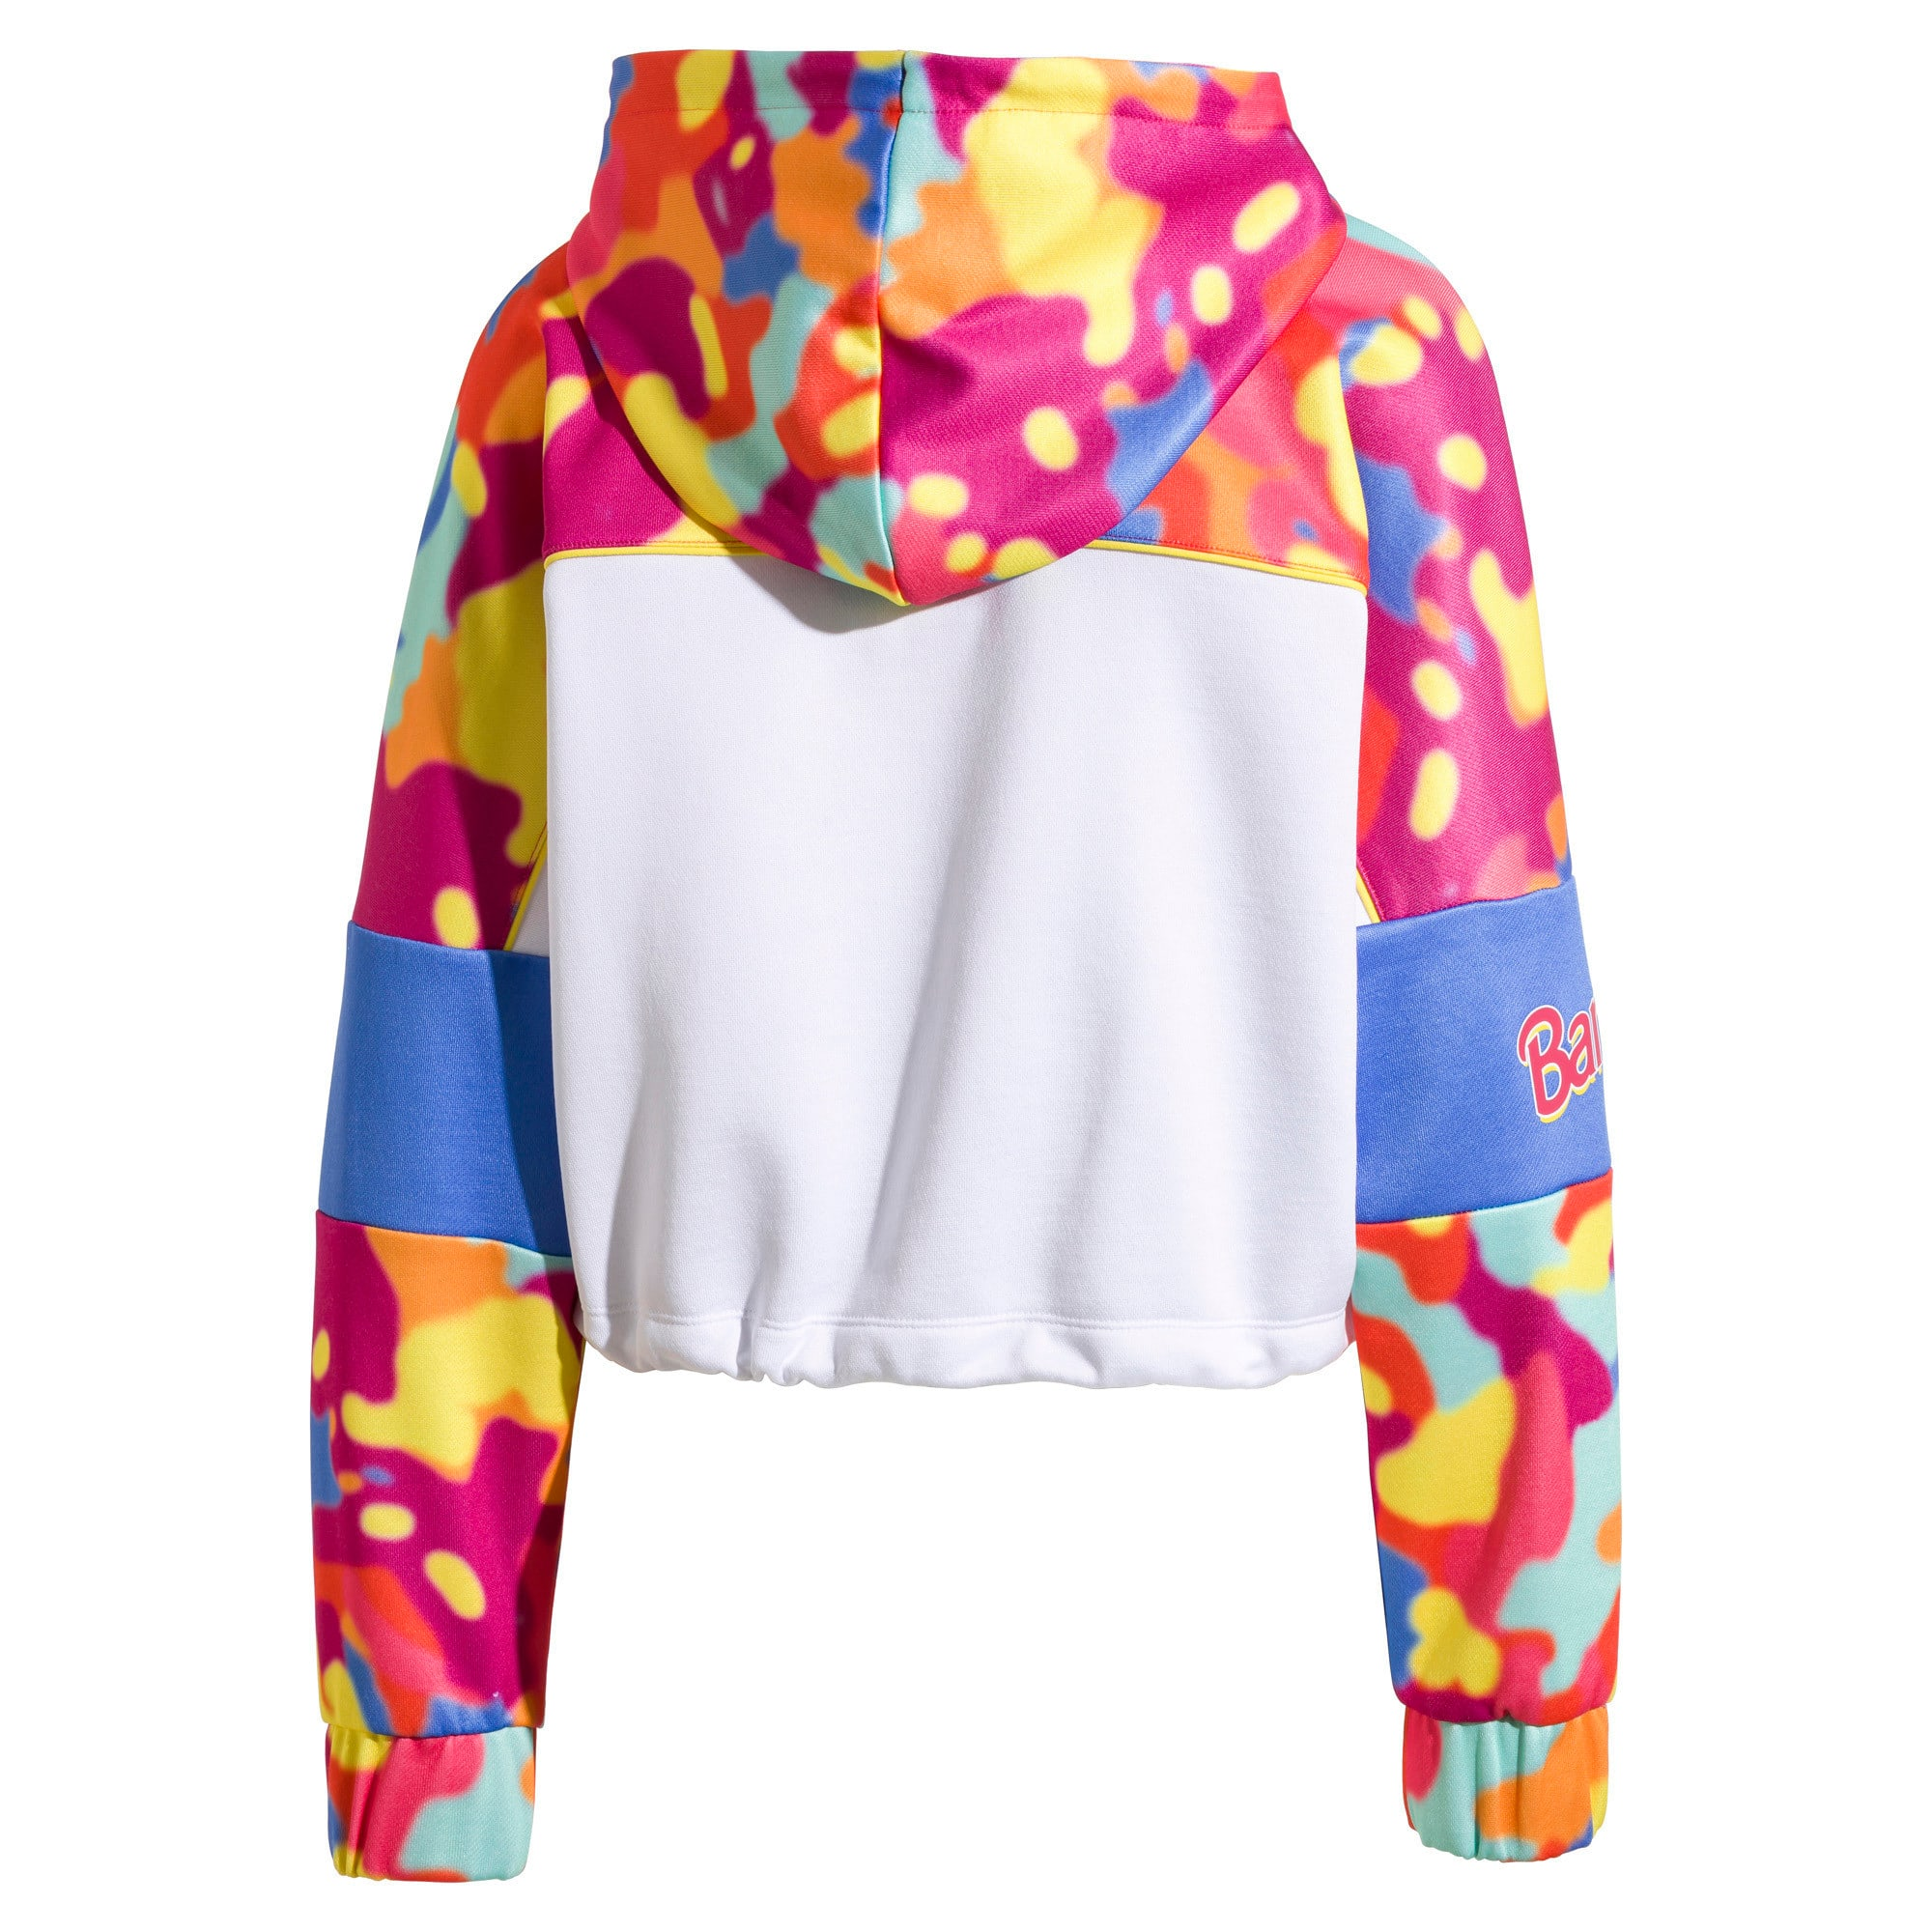 Thumbnail 2 of PUMA x BARBIE XTG Women's Track Jacket, Puma White, medium